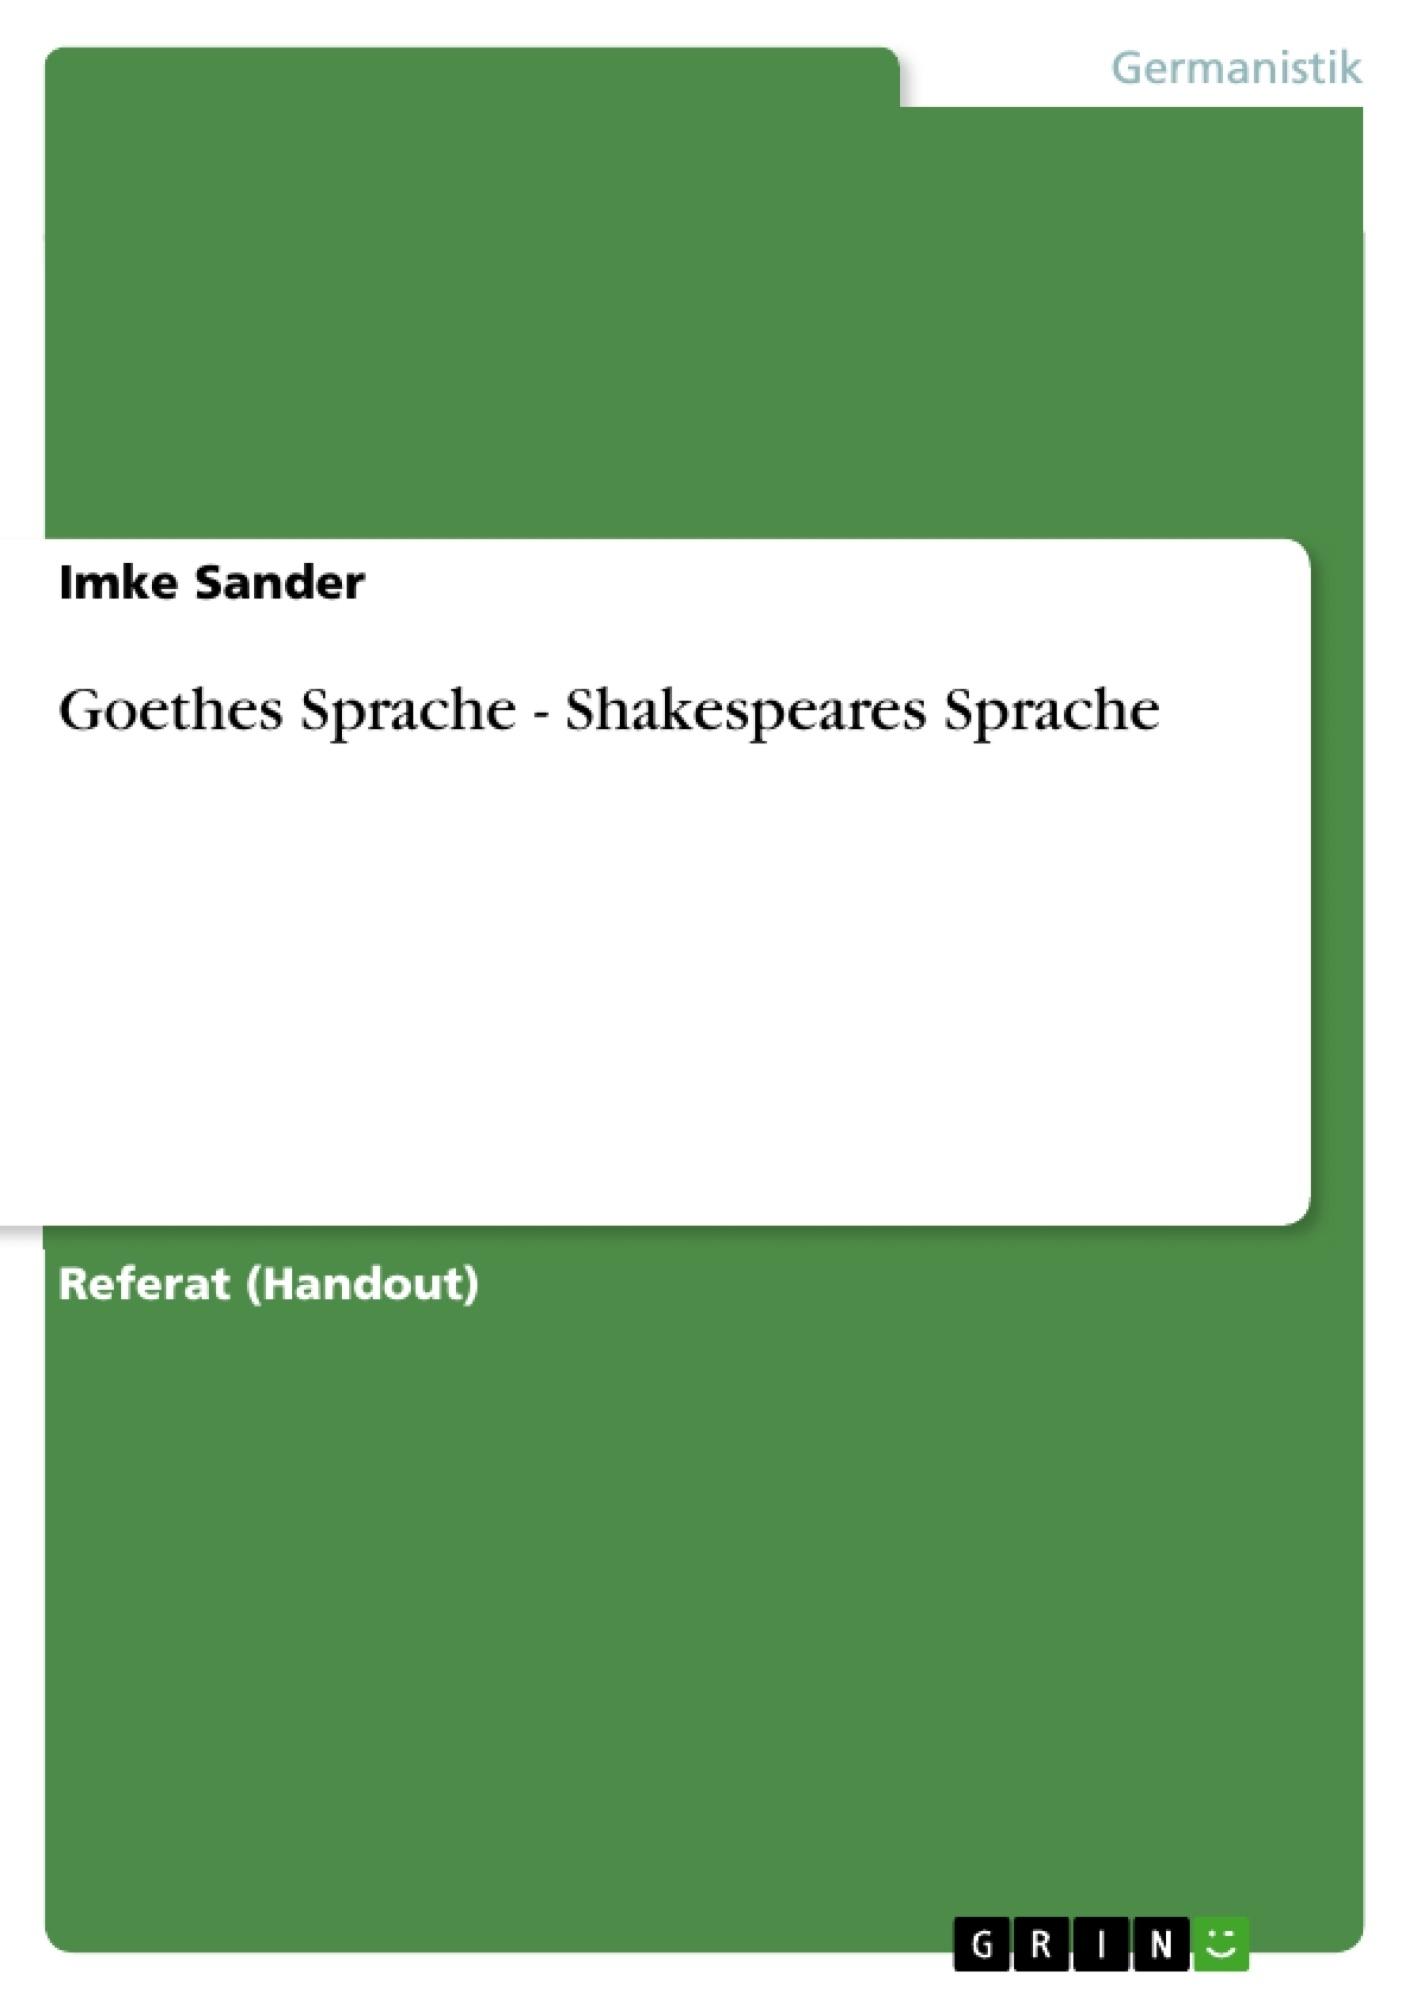 Titel: Goethes Sprache - Shakespeares Sprache